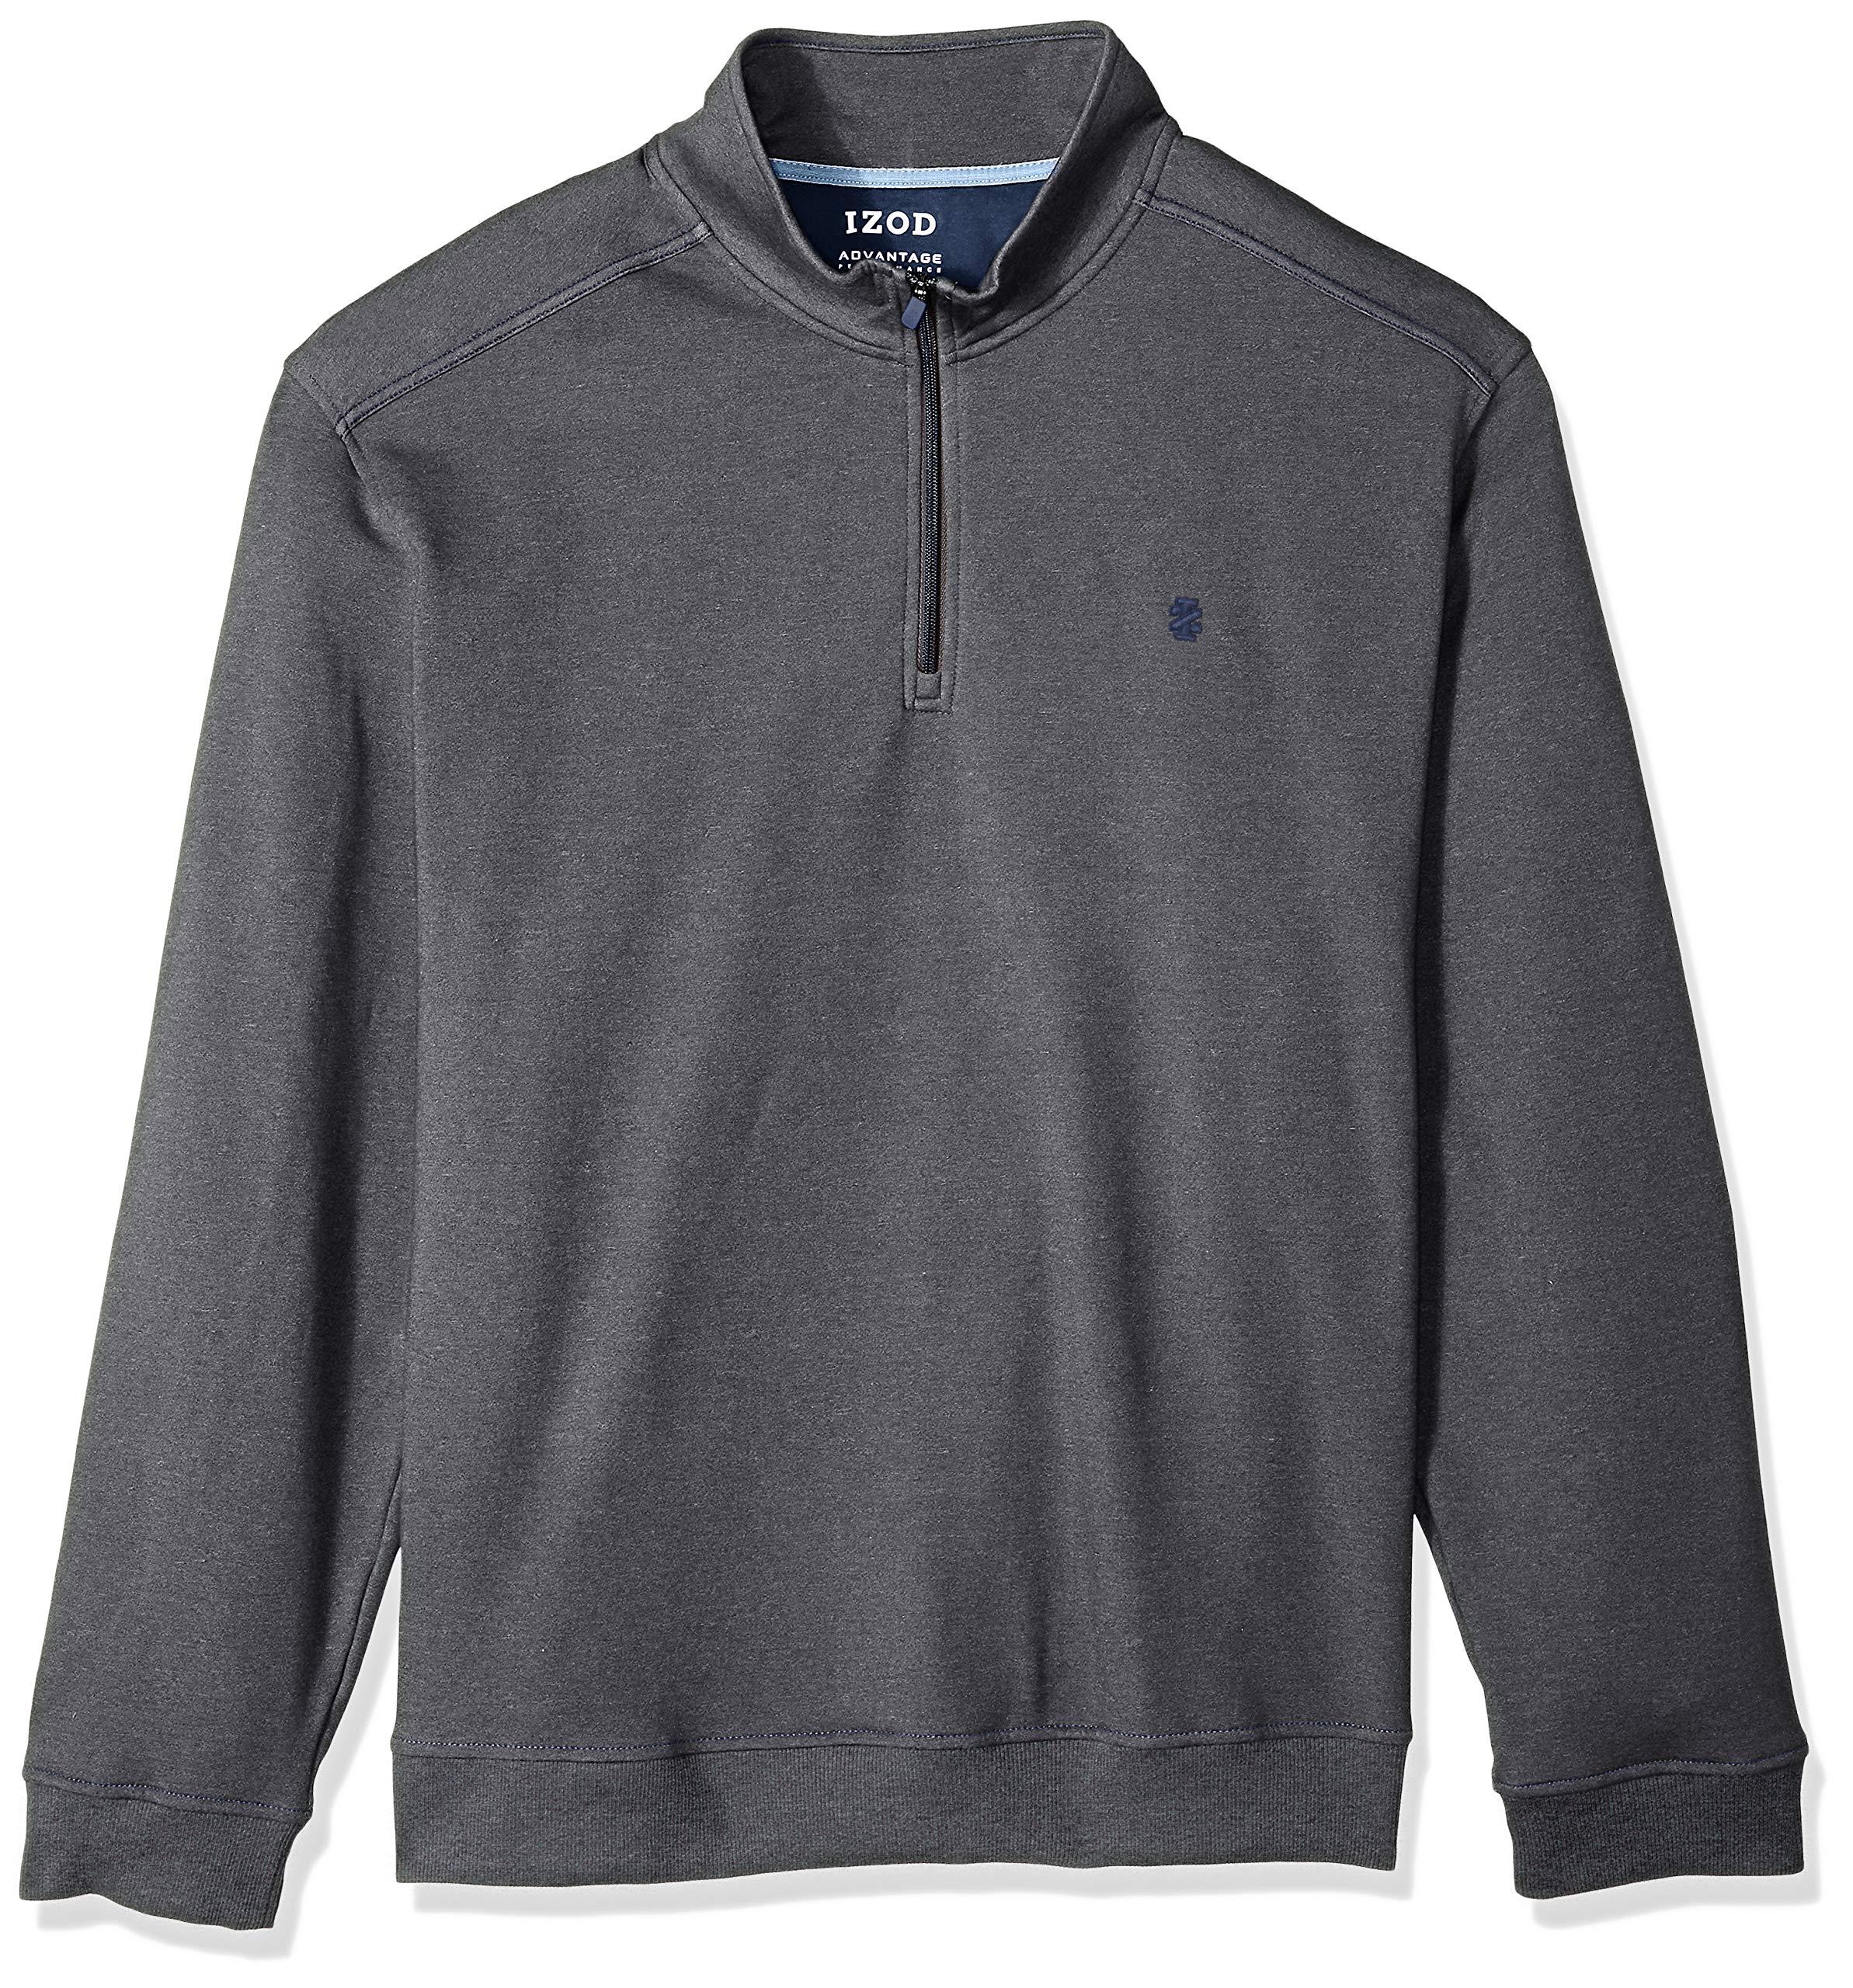 IZOD Men's Big and Tall Advantage Performance Fleece Long Sleeve 1/4 Zip Soft Pullover, Charcoal Grey, 3X-Large Big